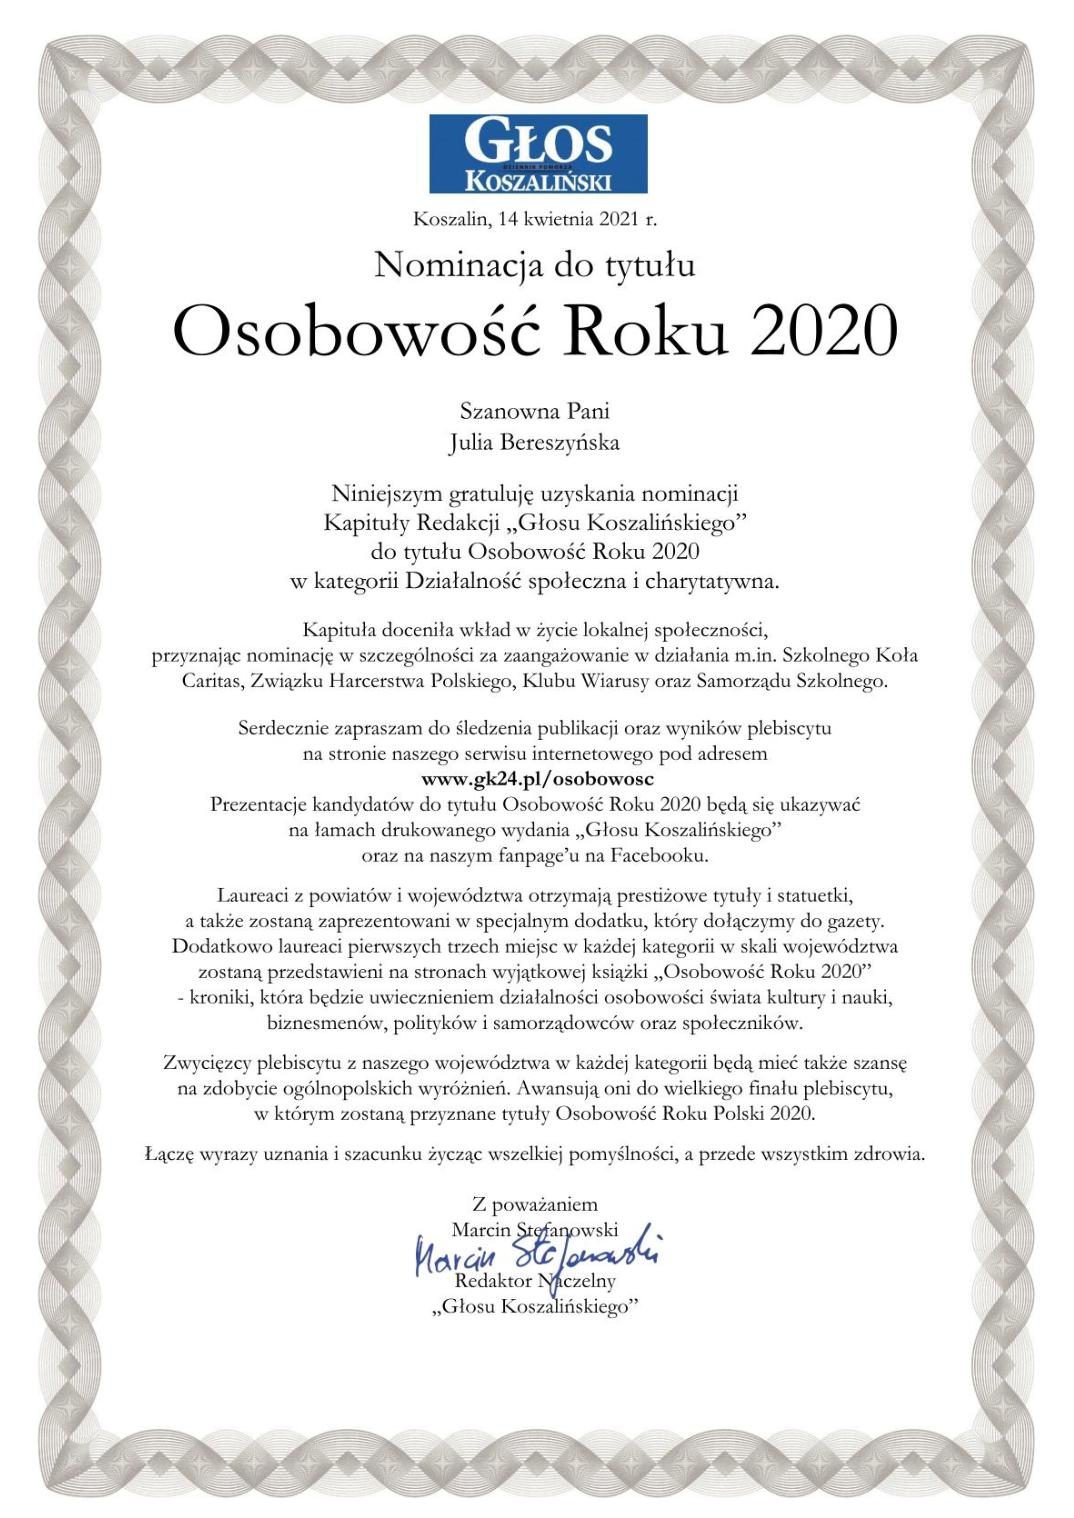 Osobowość roku J.Bereszyńska